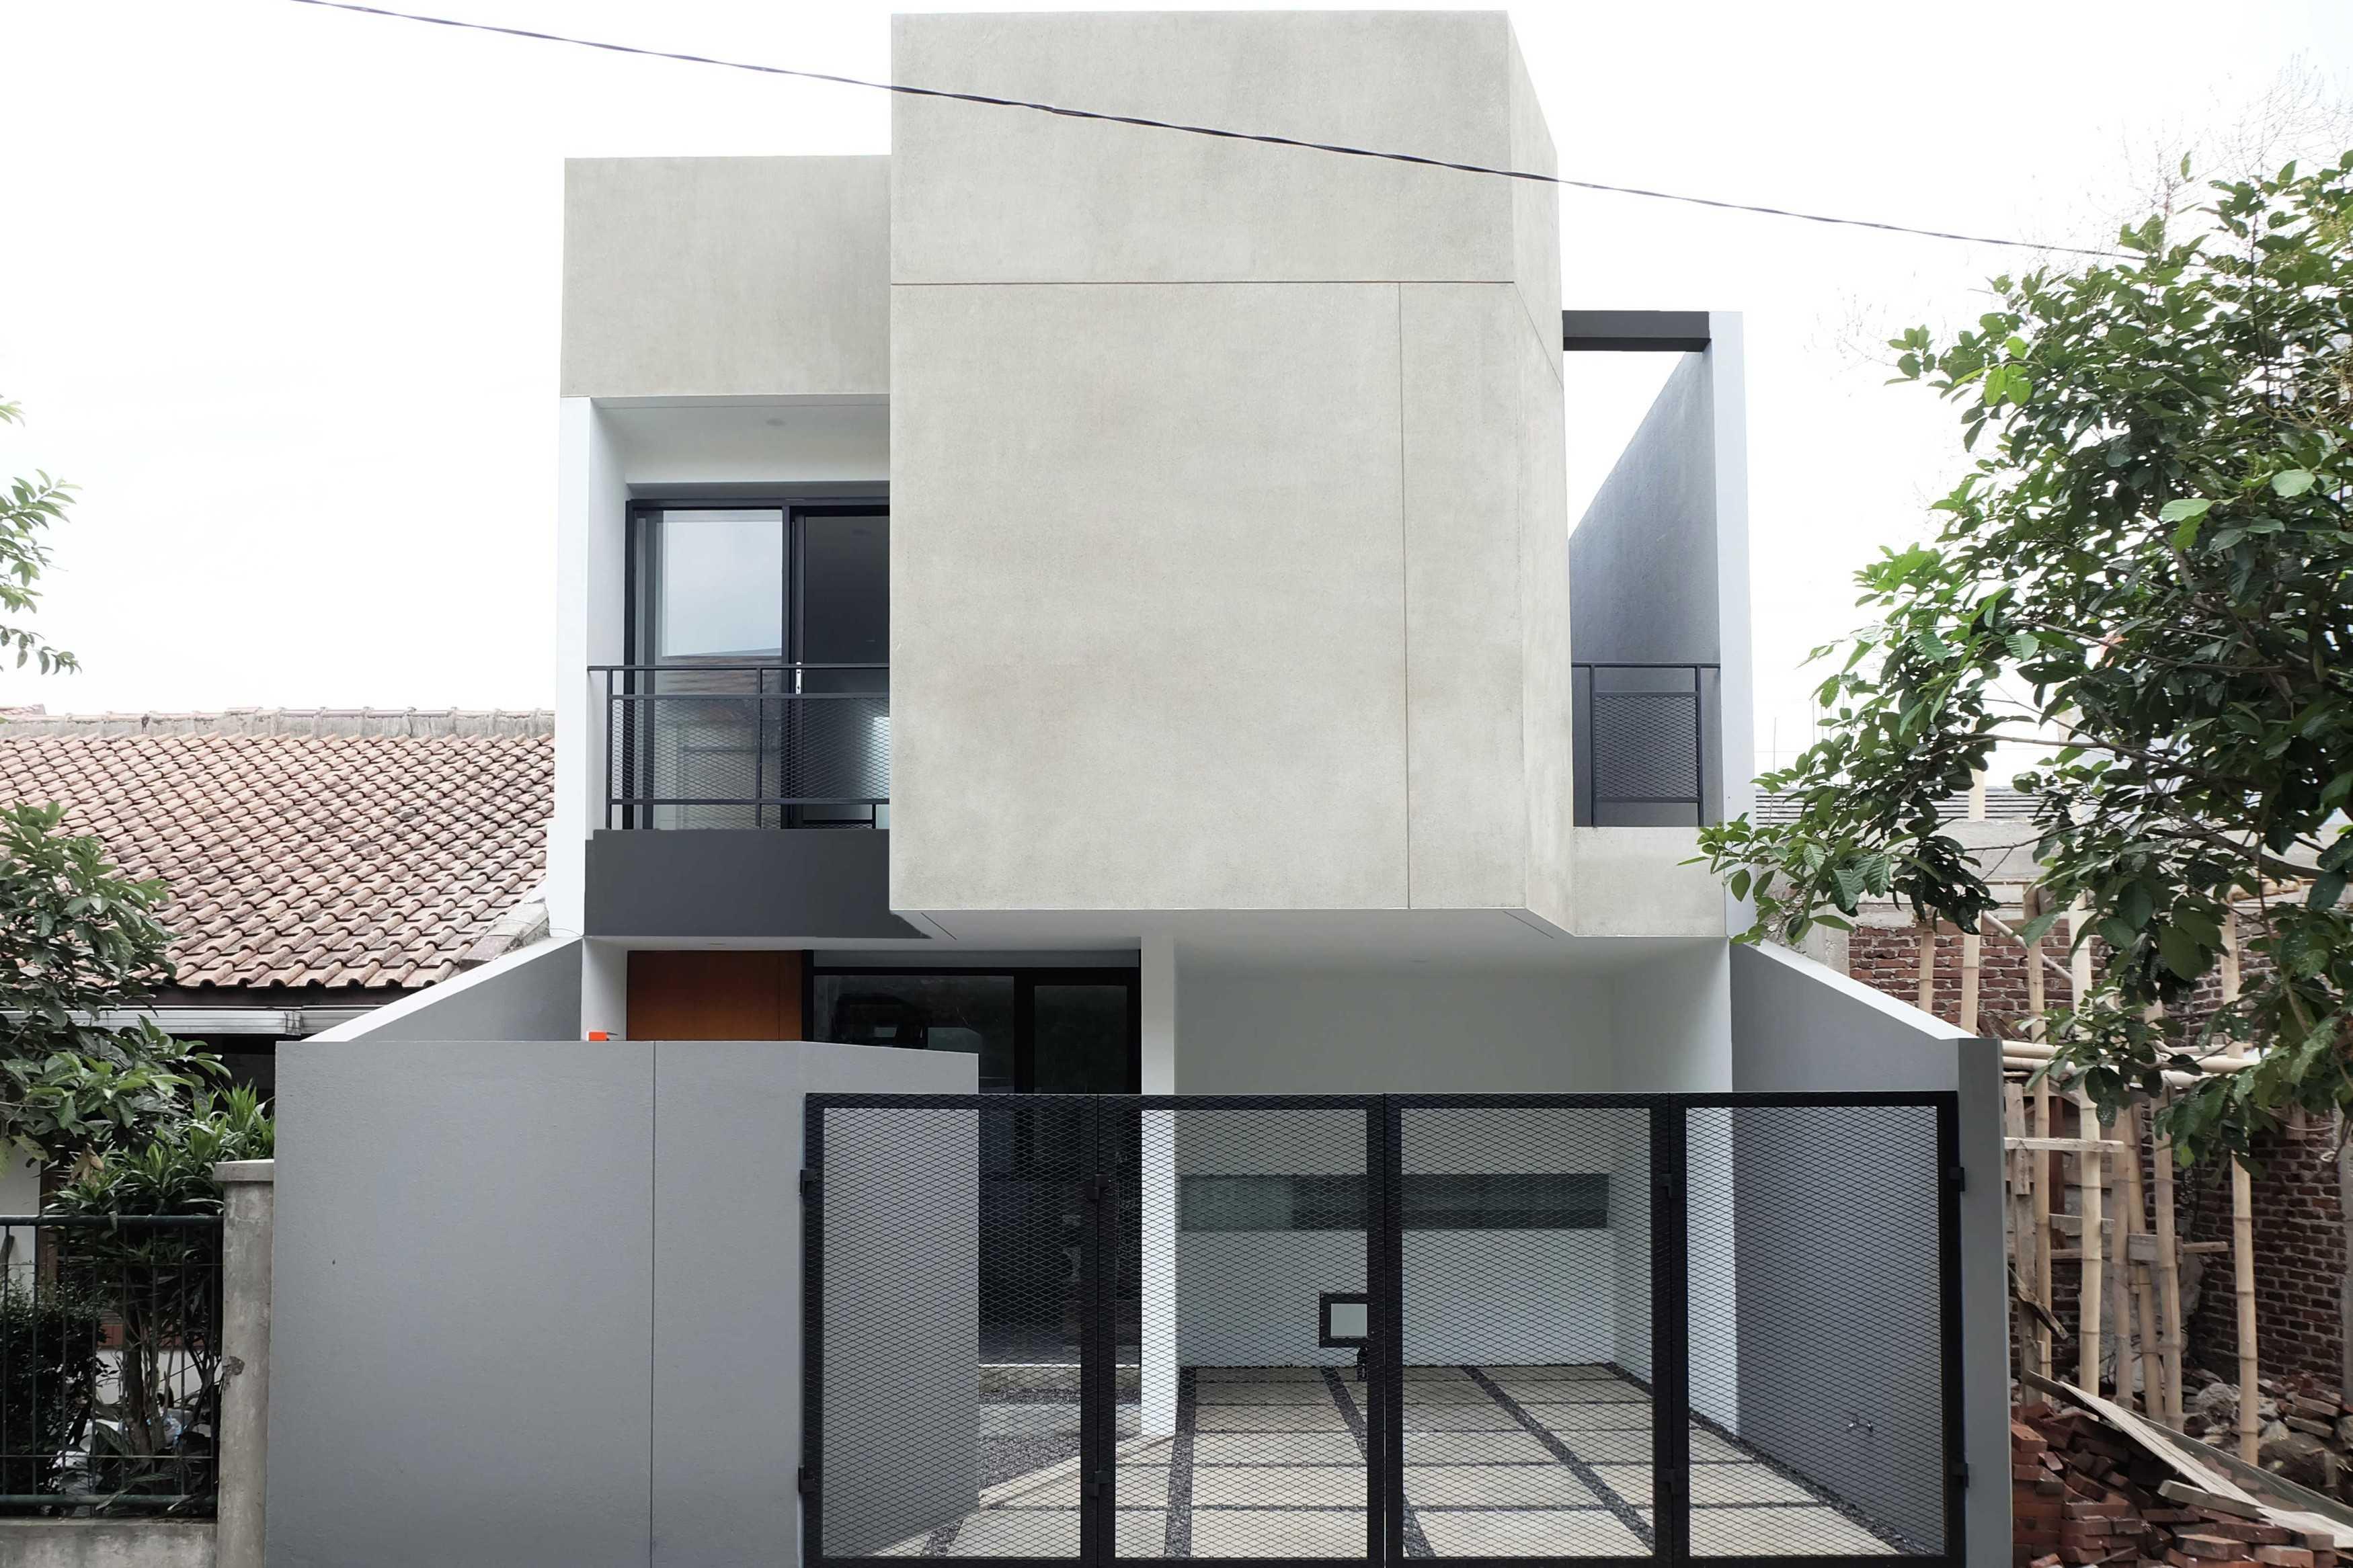 Dica Selaras Yang House Bandung, Kota Bandung, Jawa Barat, Indonesia Bandung, Kota Bandung, Jawa Barat, Indonesia Dica-Selaras-Yang-House   62805